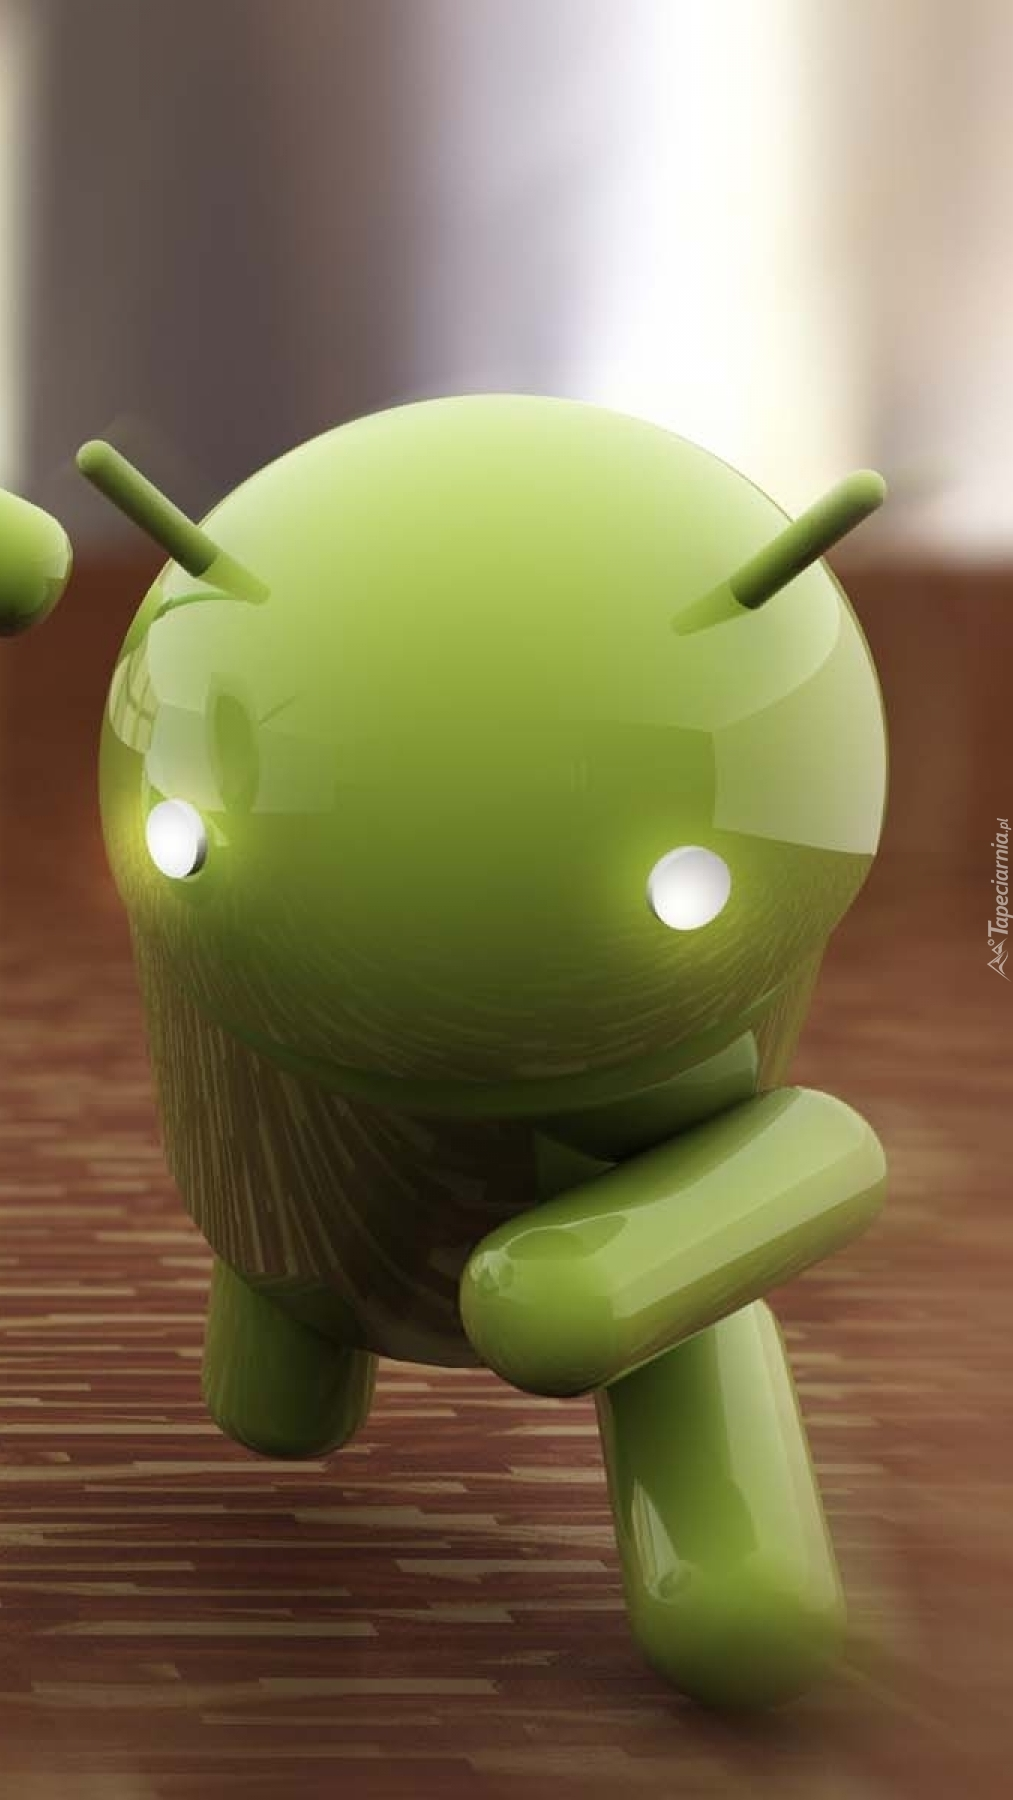 Biegnący androiď